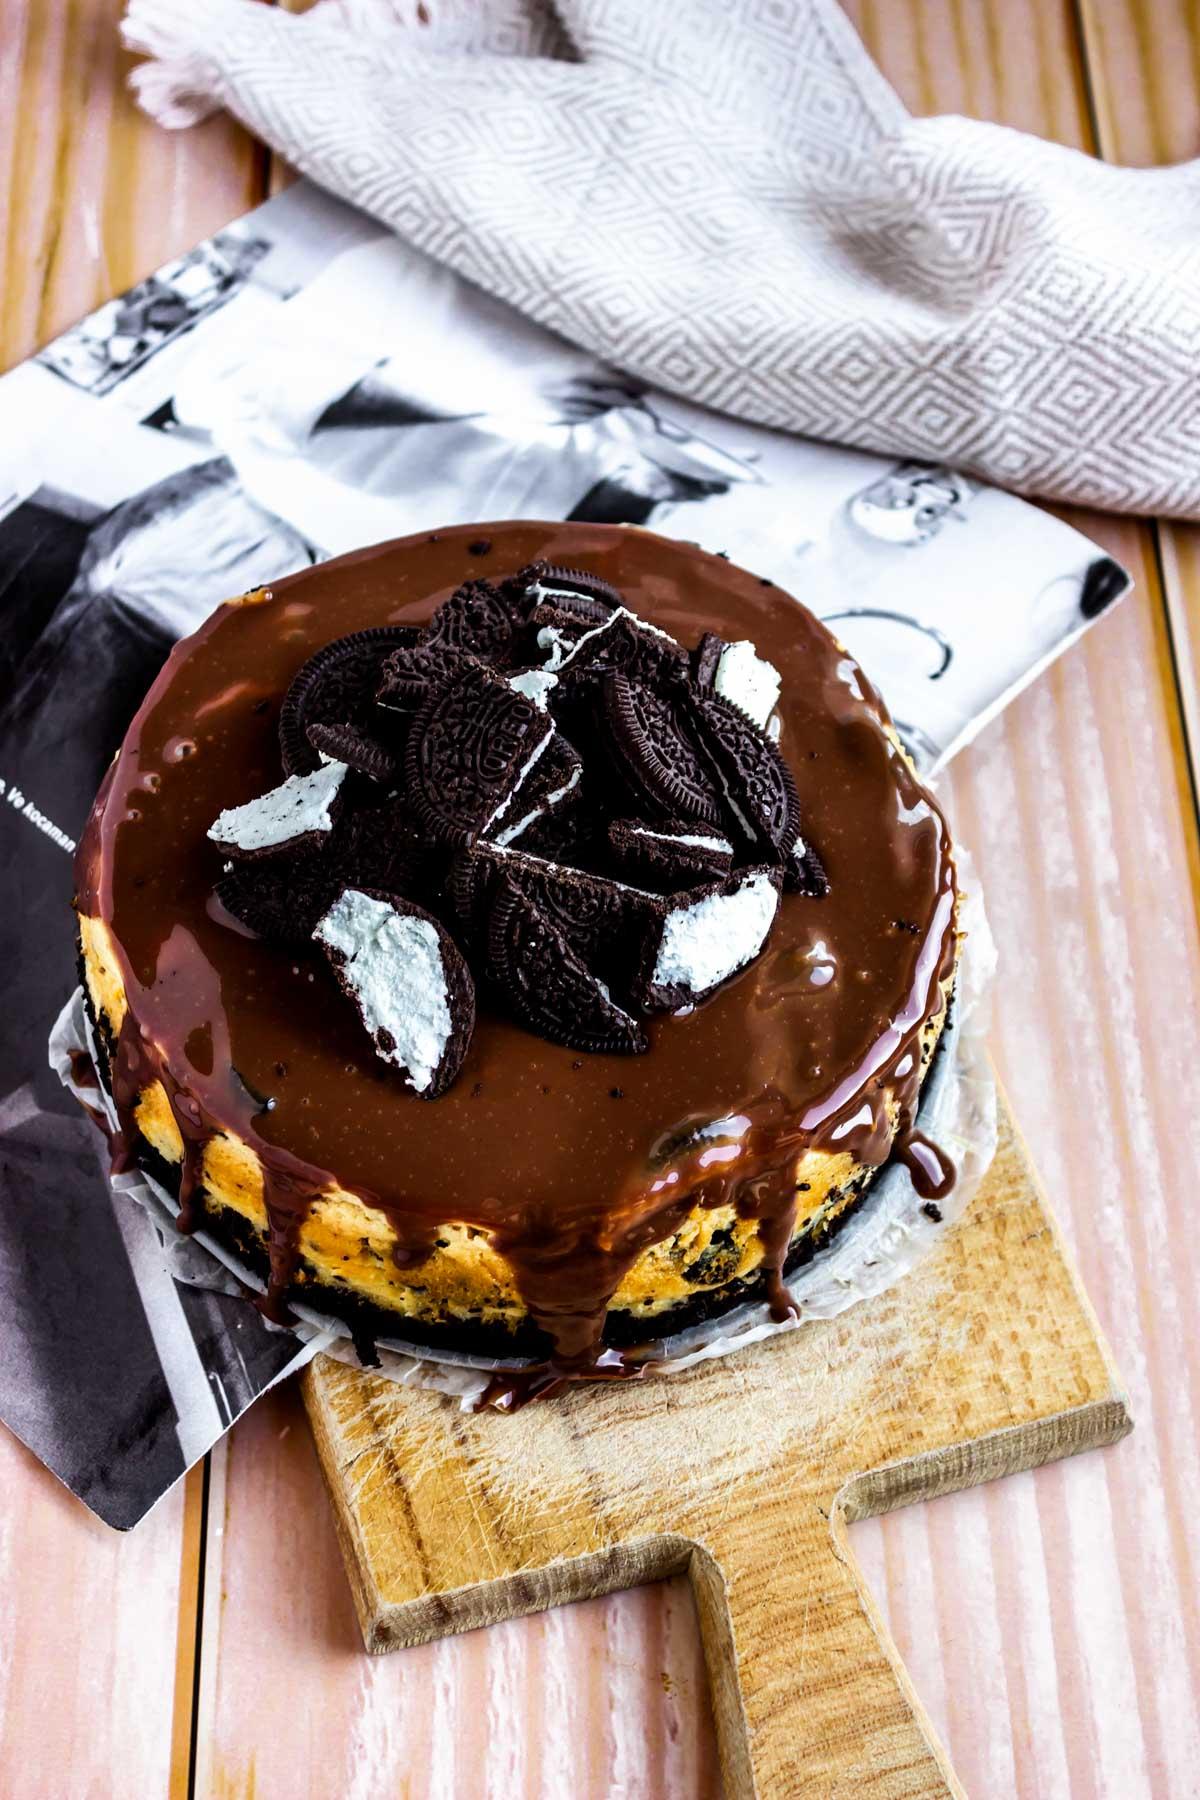 freshly made oreo cheesecake covered in chocolate ganache and crumbled cookies